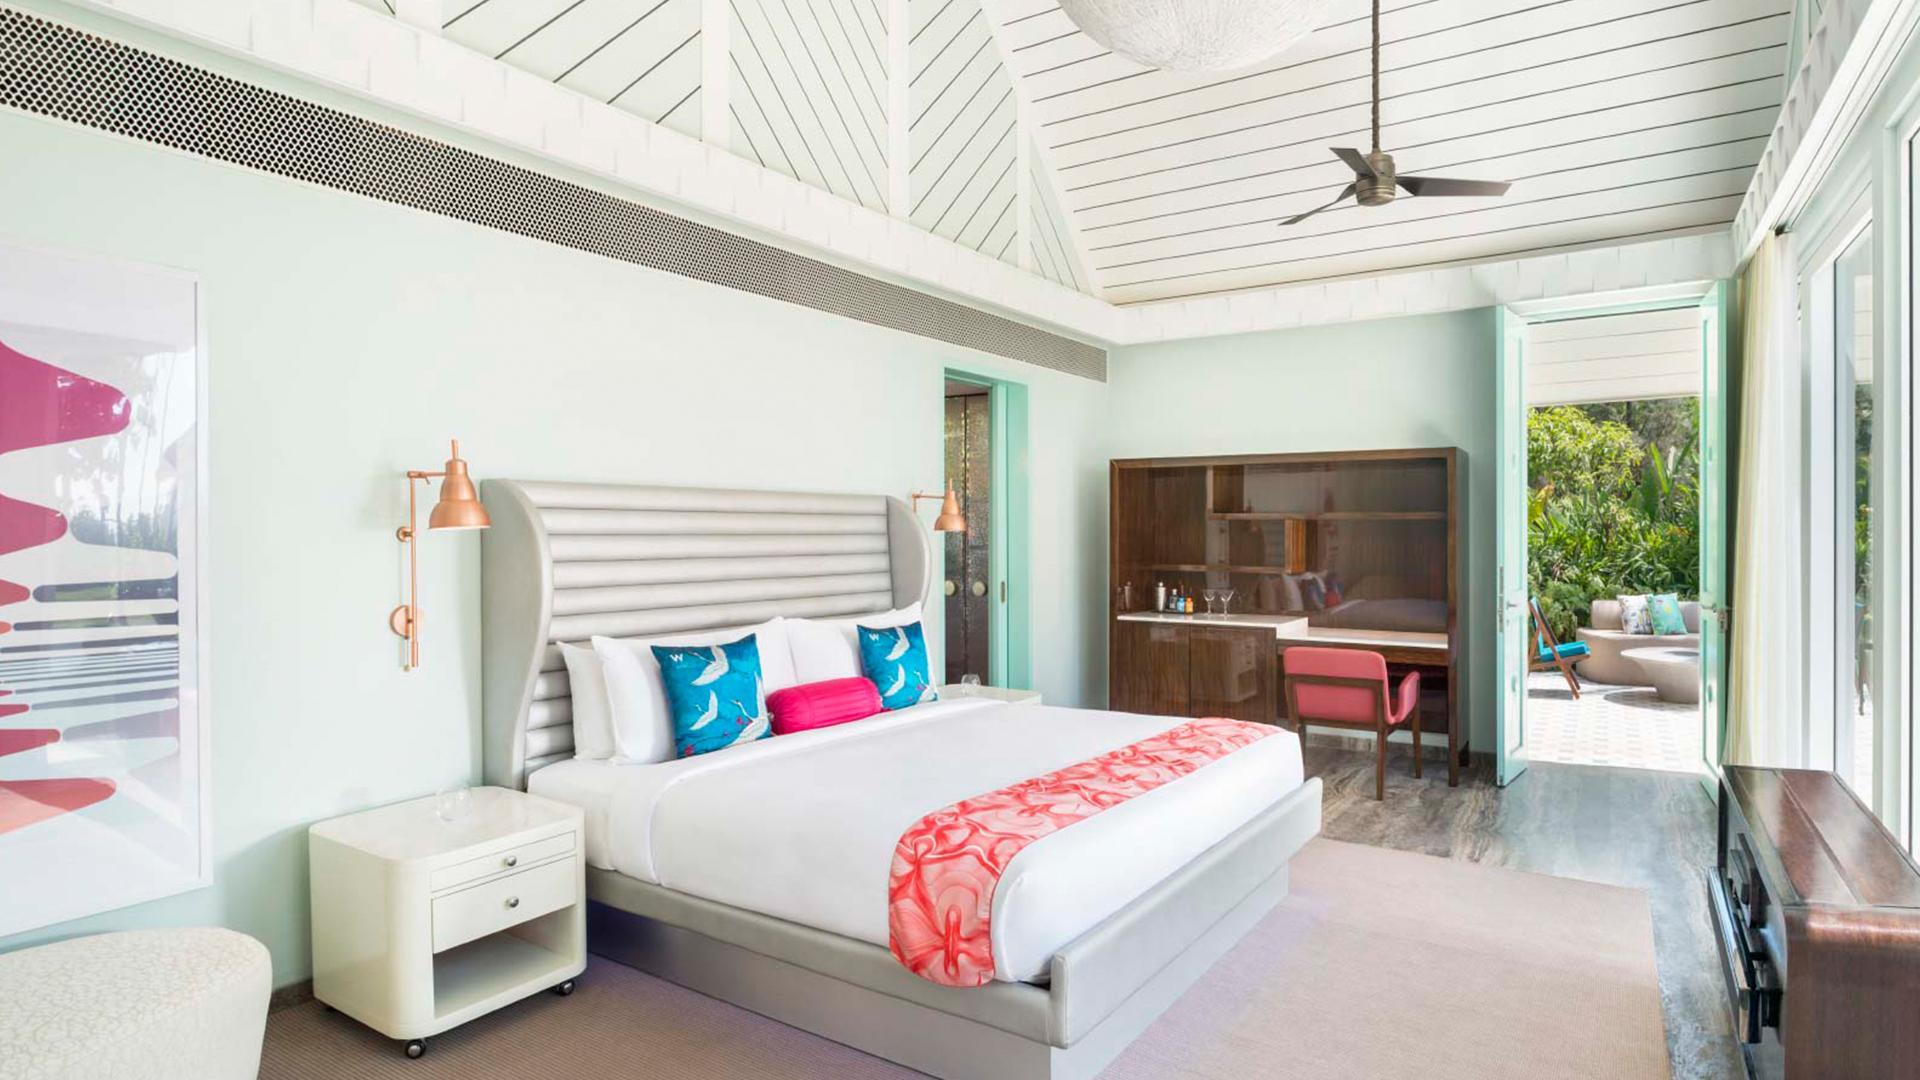 Fantastic One-Bedroom Sea View Villa image 1 at W Goa by North Goa, Goa, India